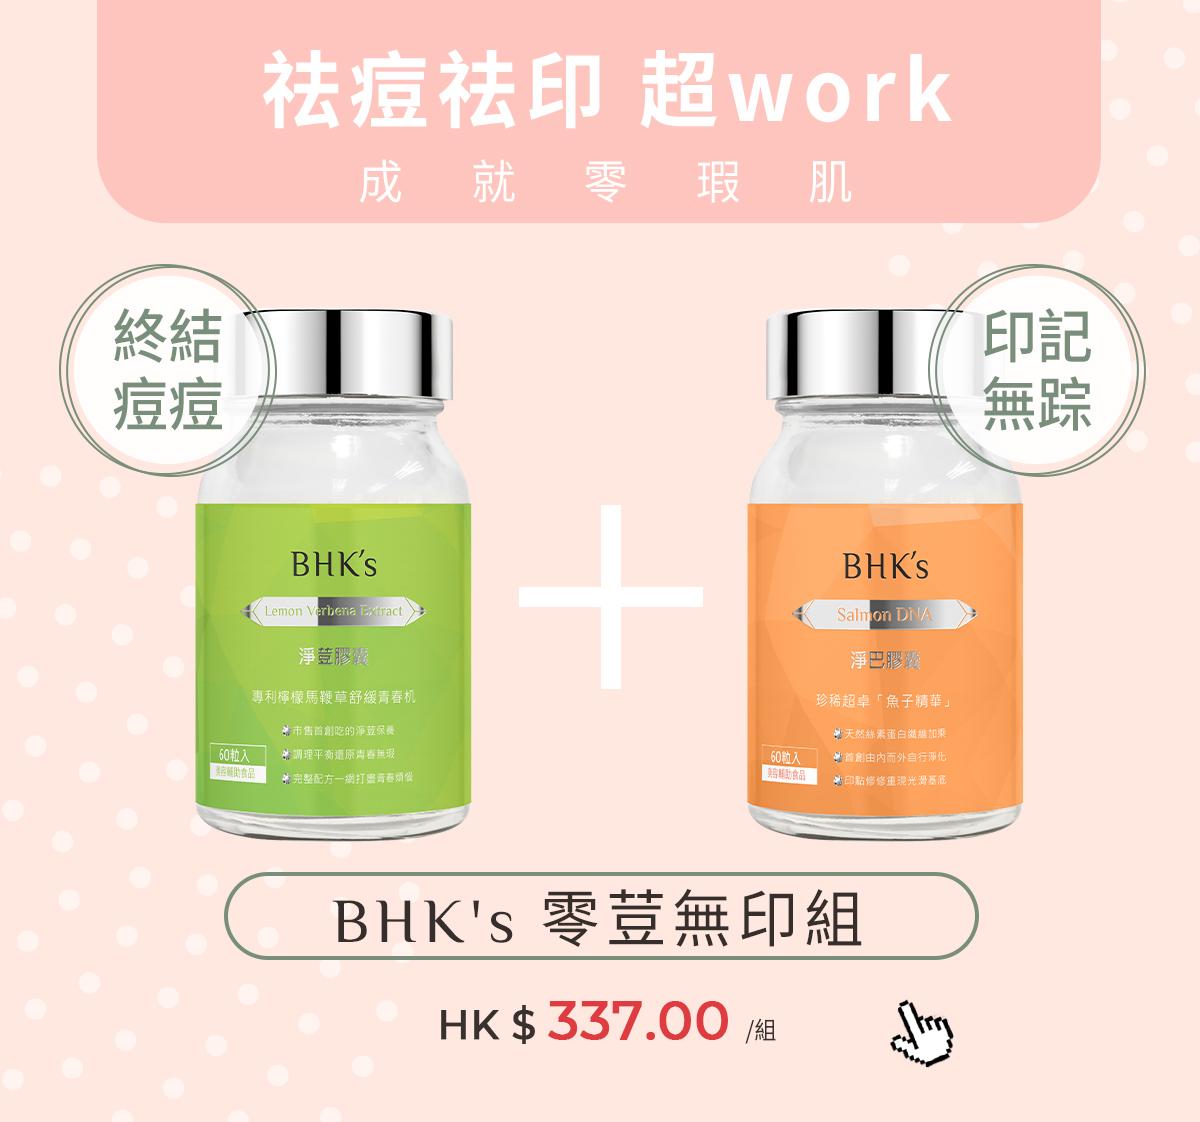 BHK 淨痘 + 淨疤祛痘祛印超 work, 成就零瑕疵皮膚, 終結暗瘡、消除疤痕。